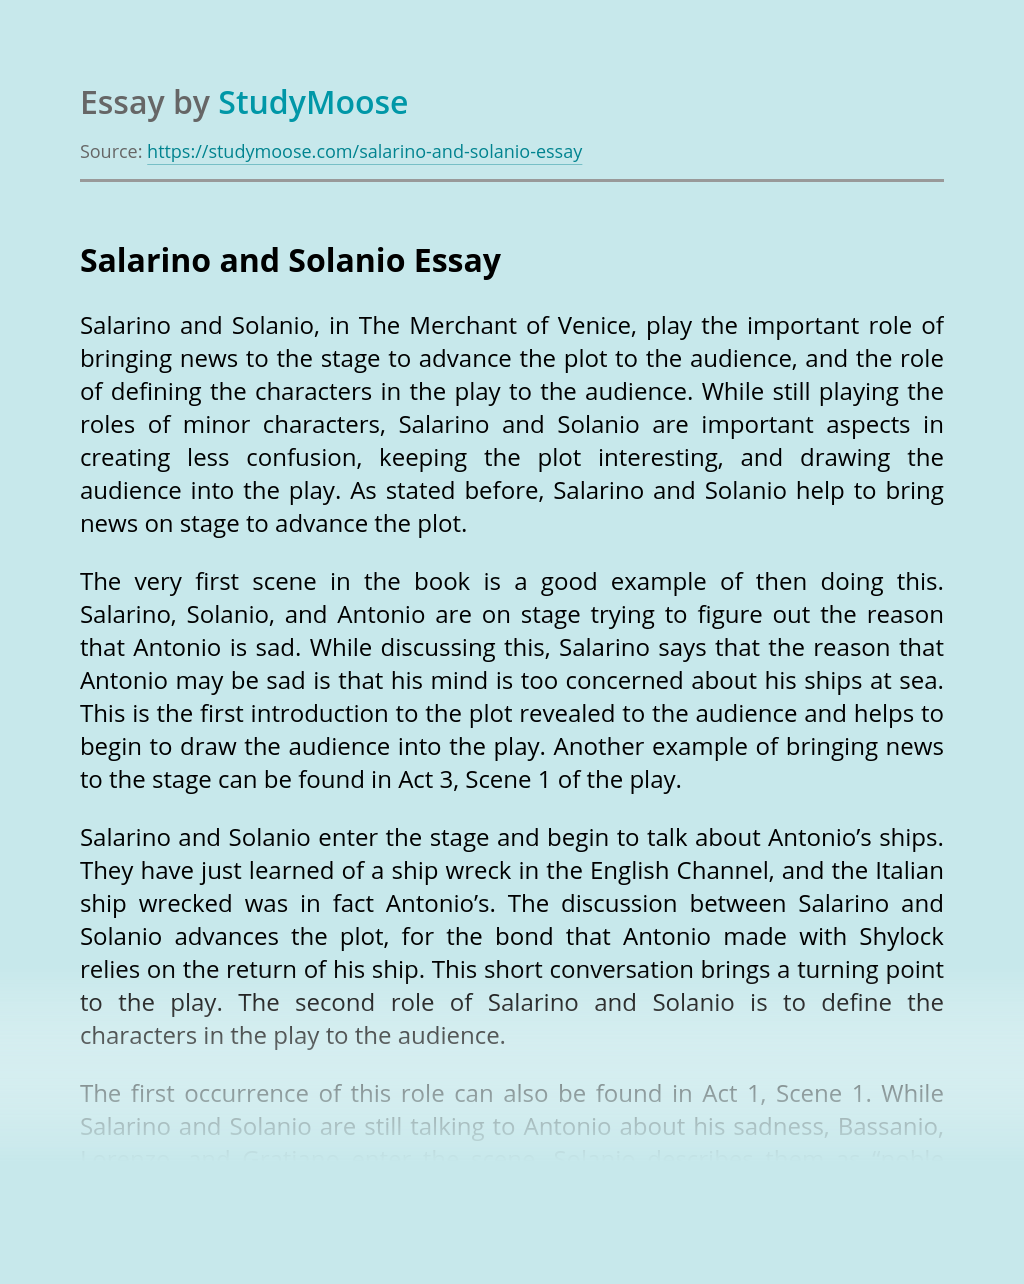 Salarino and Solanio